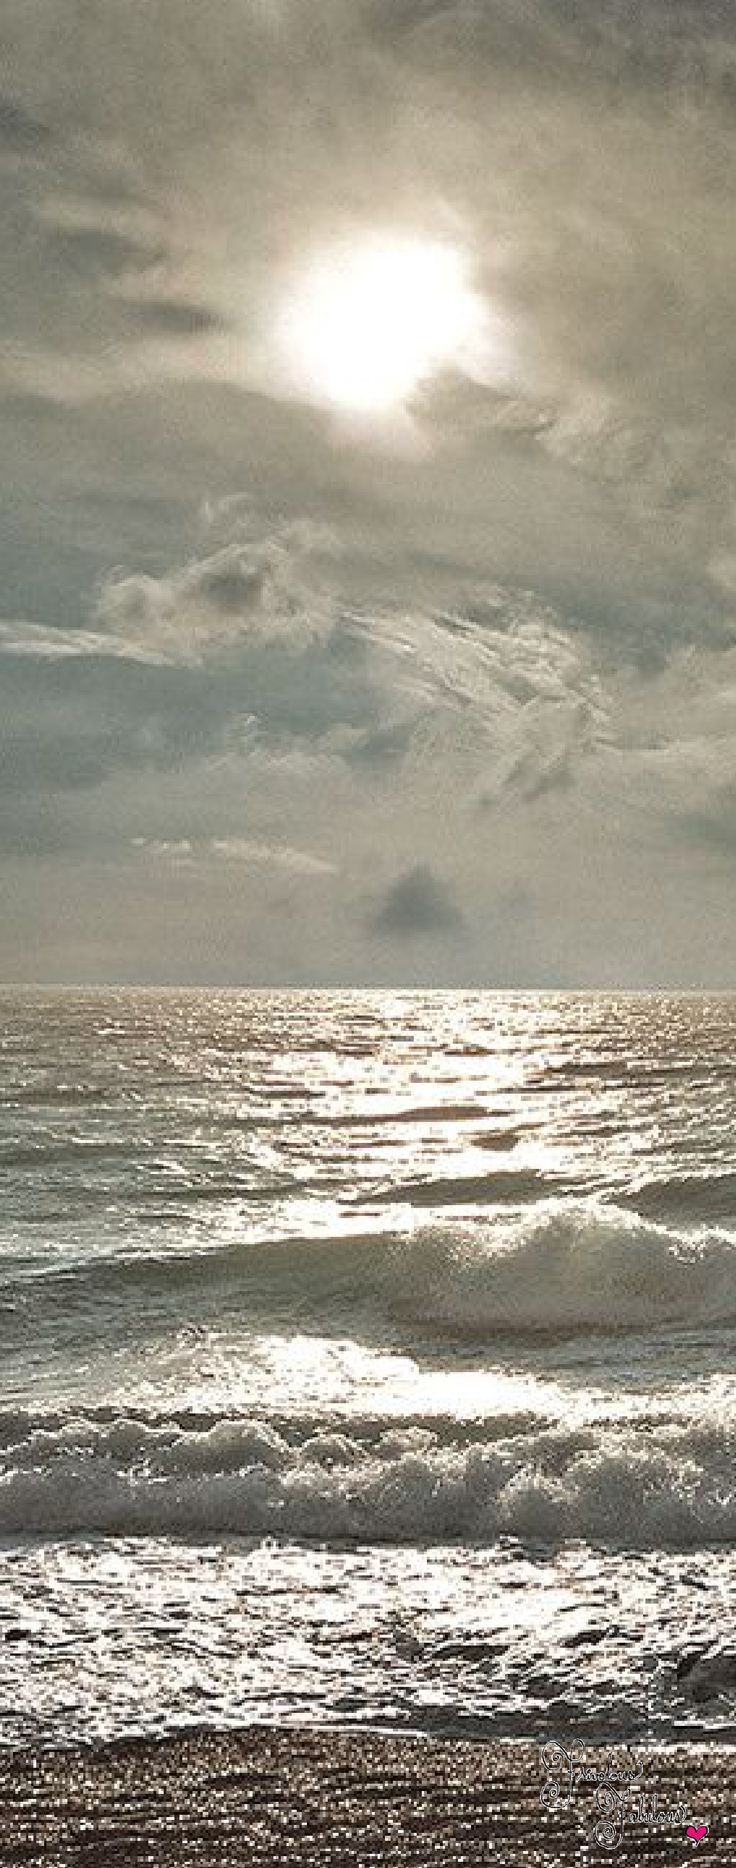 Views Of The Ocean best 25+ ocean views ideas on pinterest | ocean photography, beach